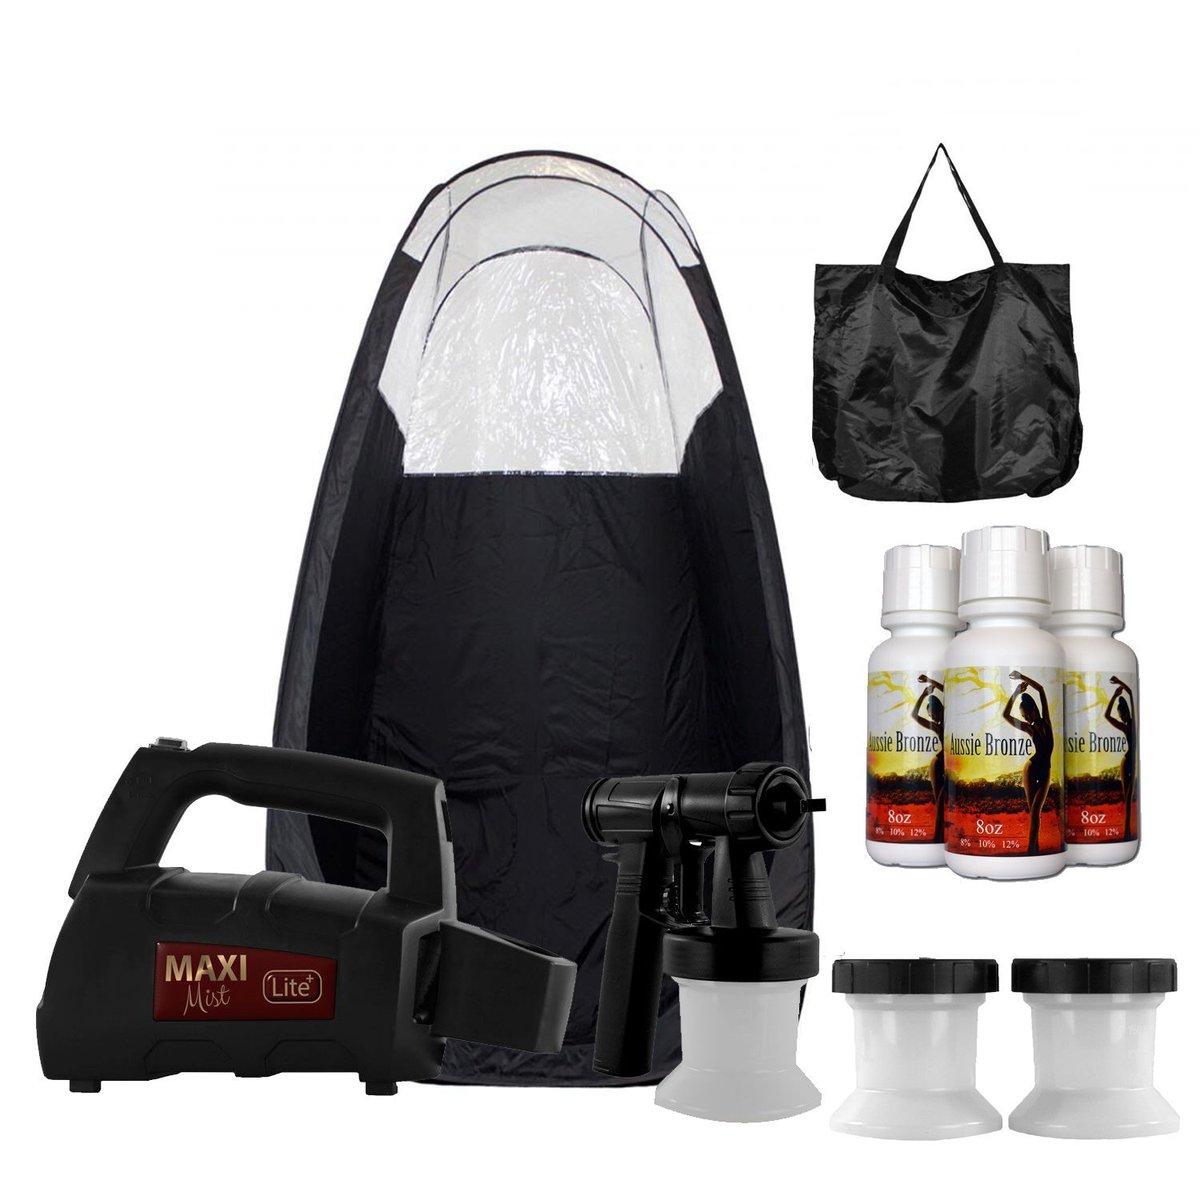 MaxiMist Lite Plus Tan Spray Machine